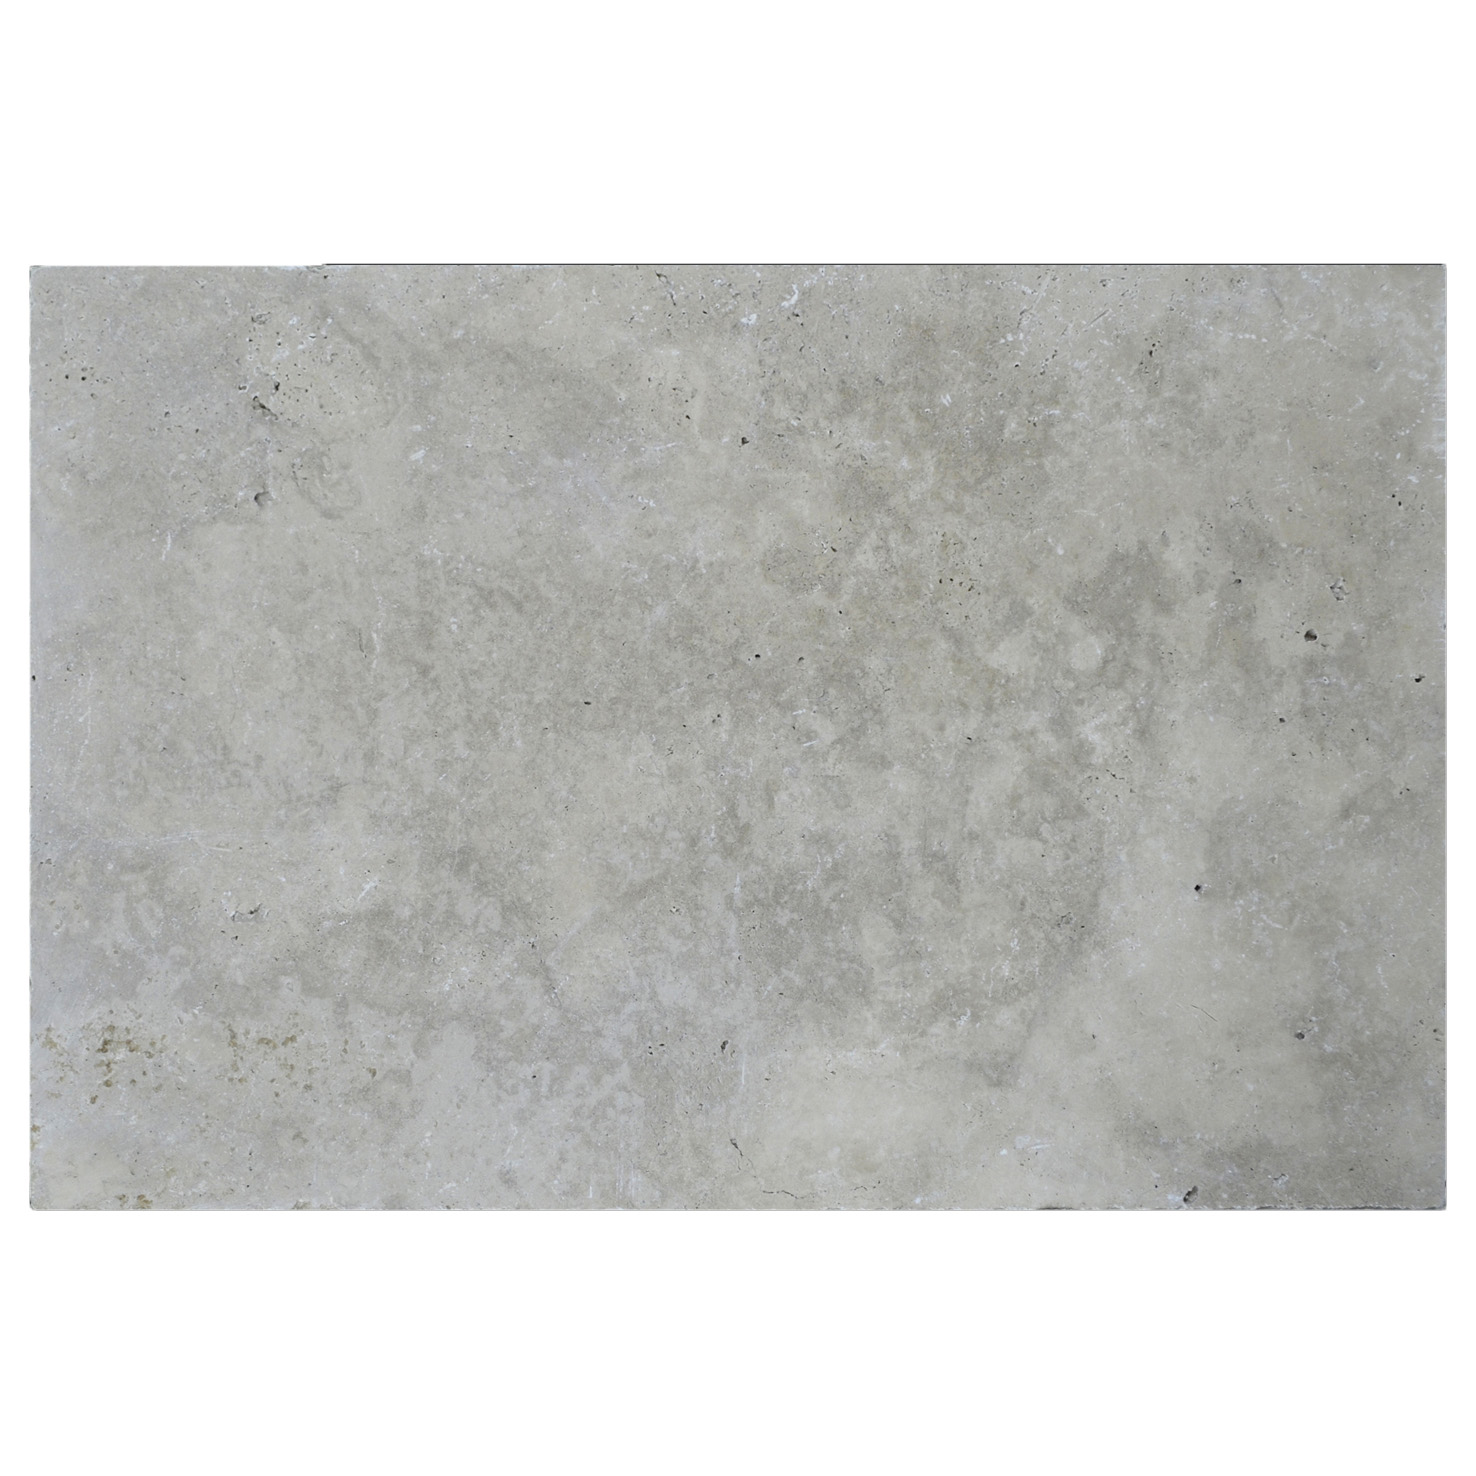 Toscana Tumbled Travertine Pavers 16x24-pavers sale-Atlantic Stone Source